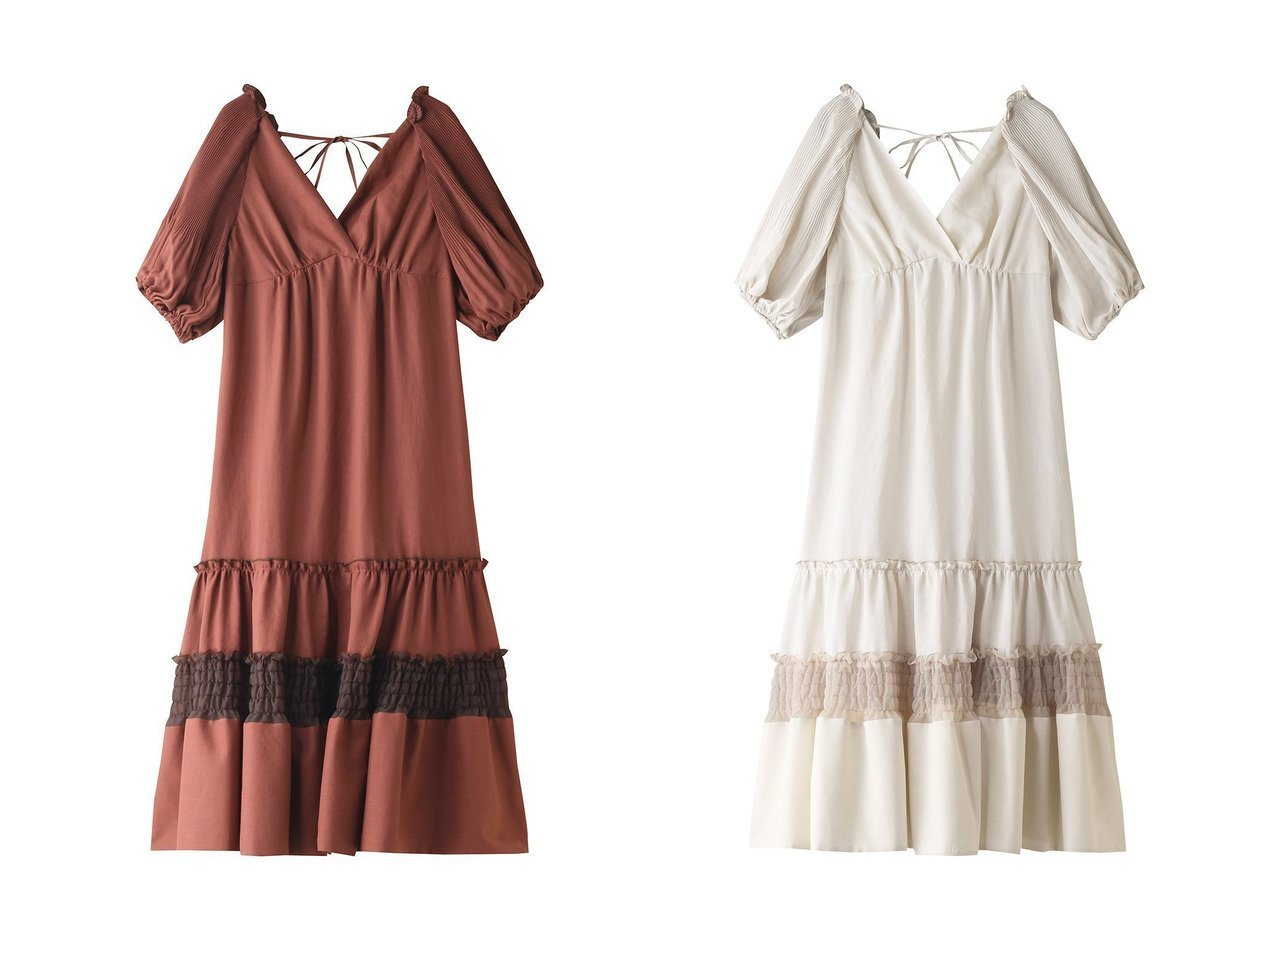 【LANVIN en Bleu/ランバン オン ブルー】のボリュームスリーブカシュクールワンピース 【ワンピース・ドレス】おすすめ!人気、トレンド・レディースファッションの通販 おすすめで人気の流行・トレンド、ファッションの通販商品 インテリア・家具・メンズファッション・キッズファッション・レディースファッション・服の通販 founy(ファニー) https://founy.com/ ファッション Fashion レディースファッション WOMEN ワンピース Dress スリーブ プリーツ |ID:crp329100000046222